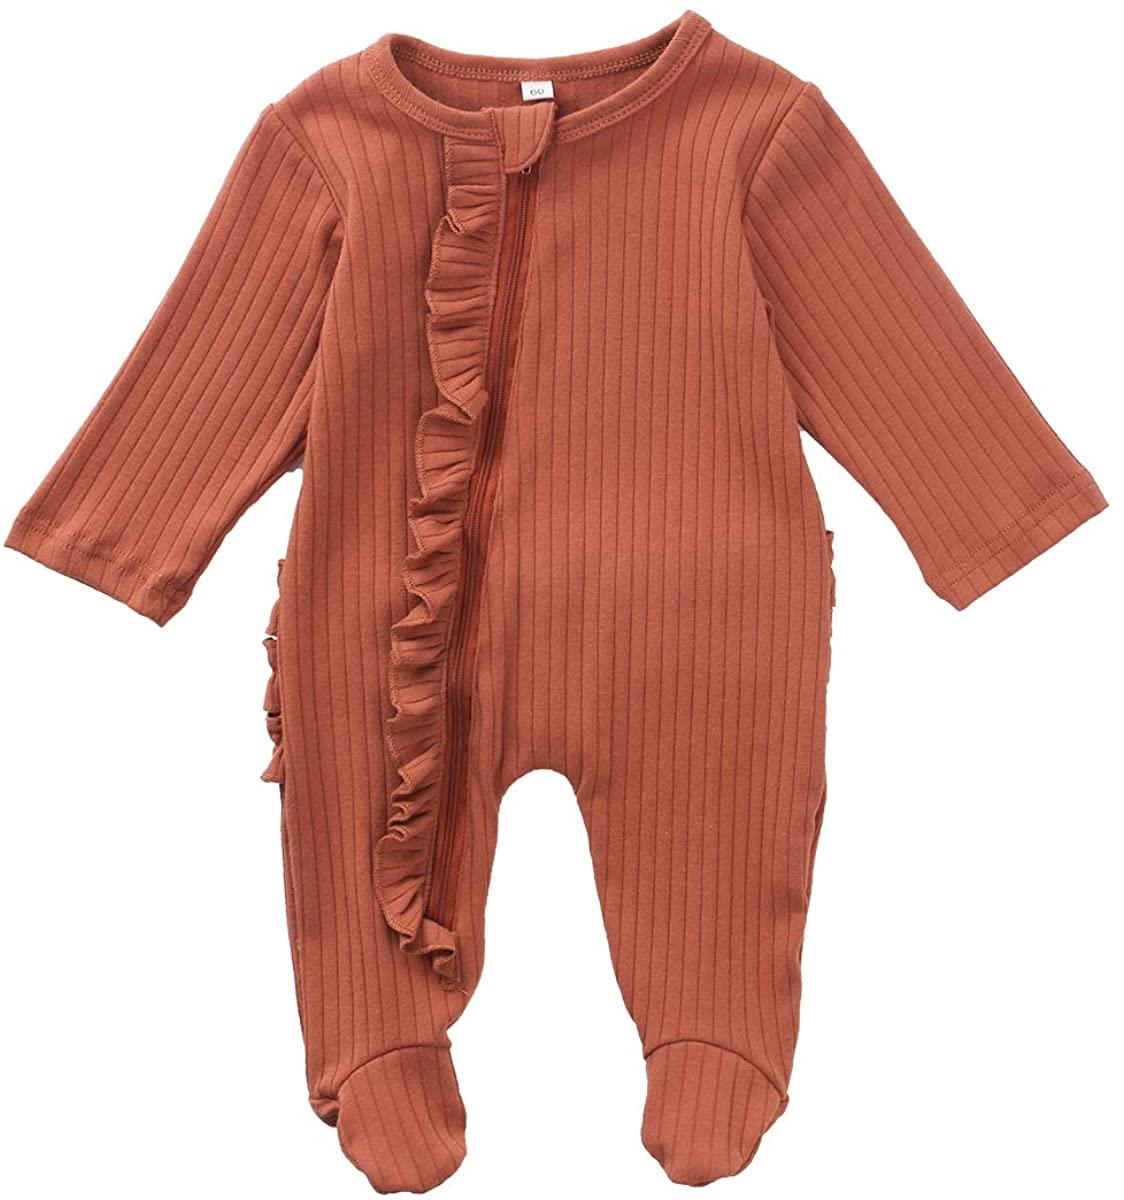 Newborn Baby Boy Girl Zipper Footed Pajamas Ribbed Ruffle One Piece Footie Romper Jumpsuits Sleeper Pjs